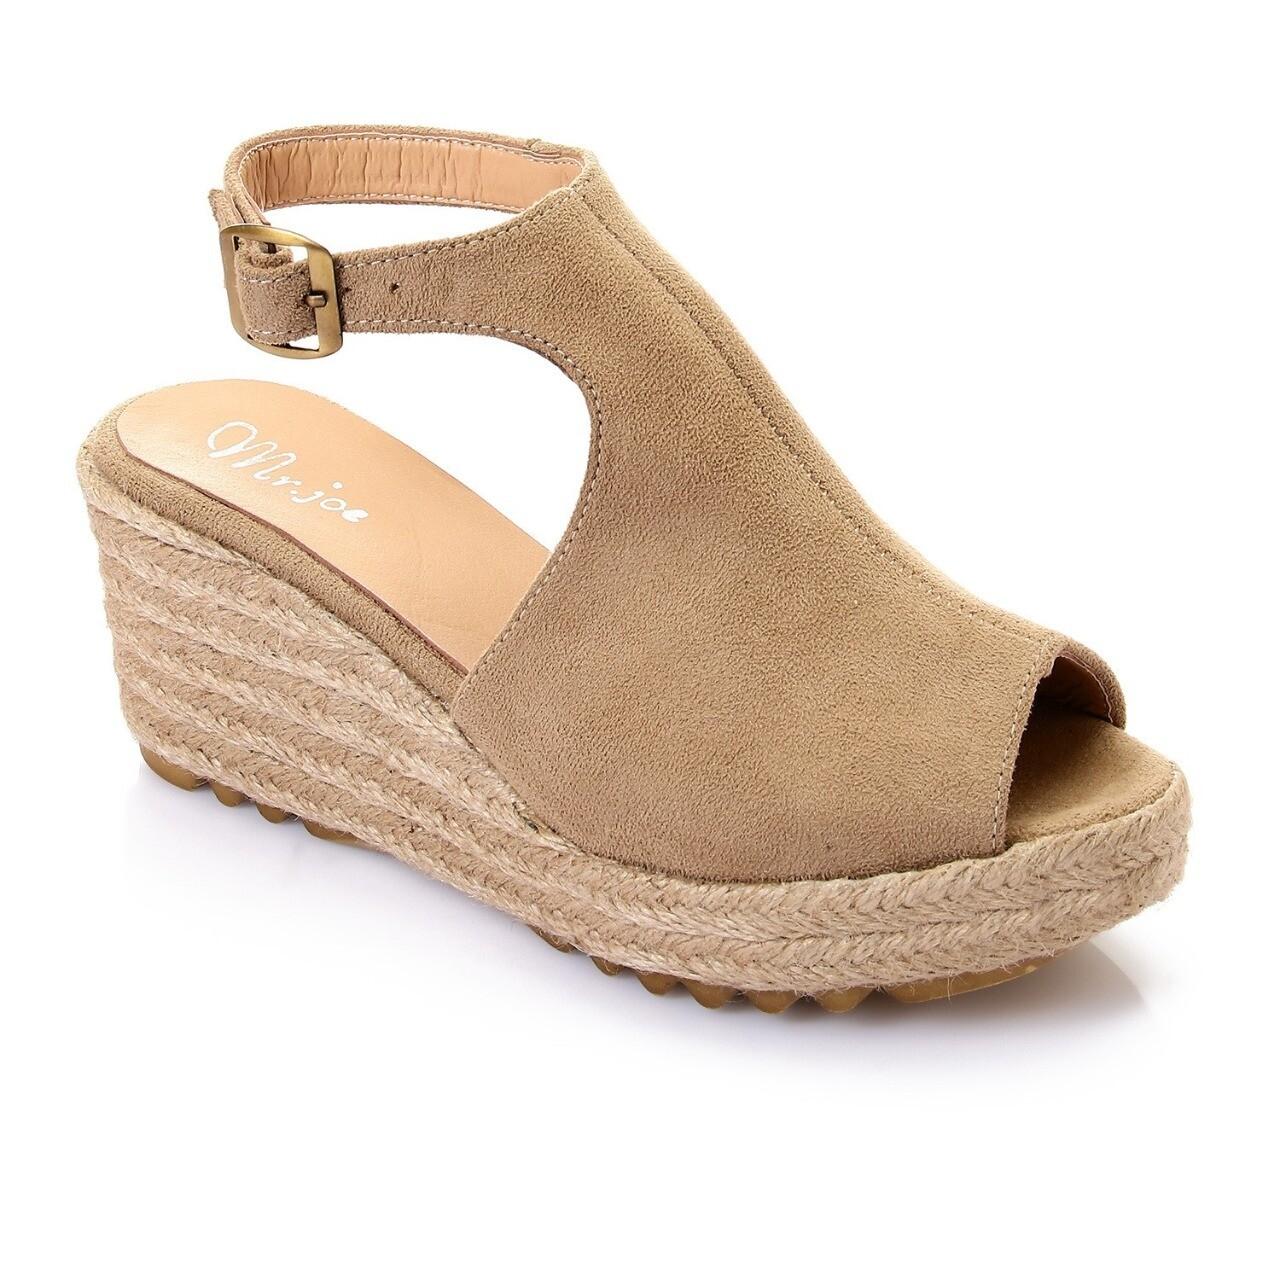 3454 Sandal - Beige